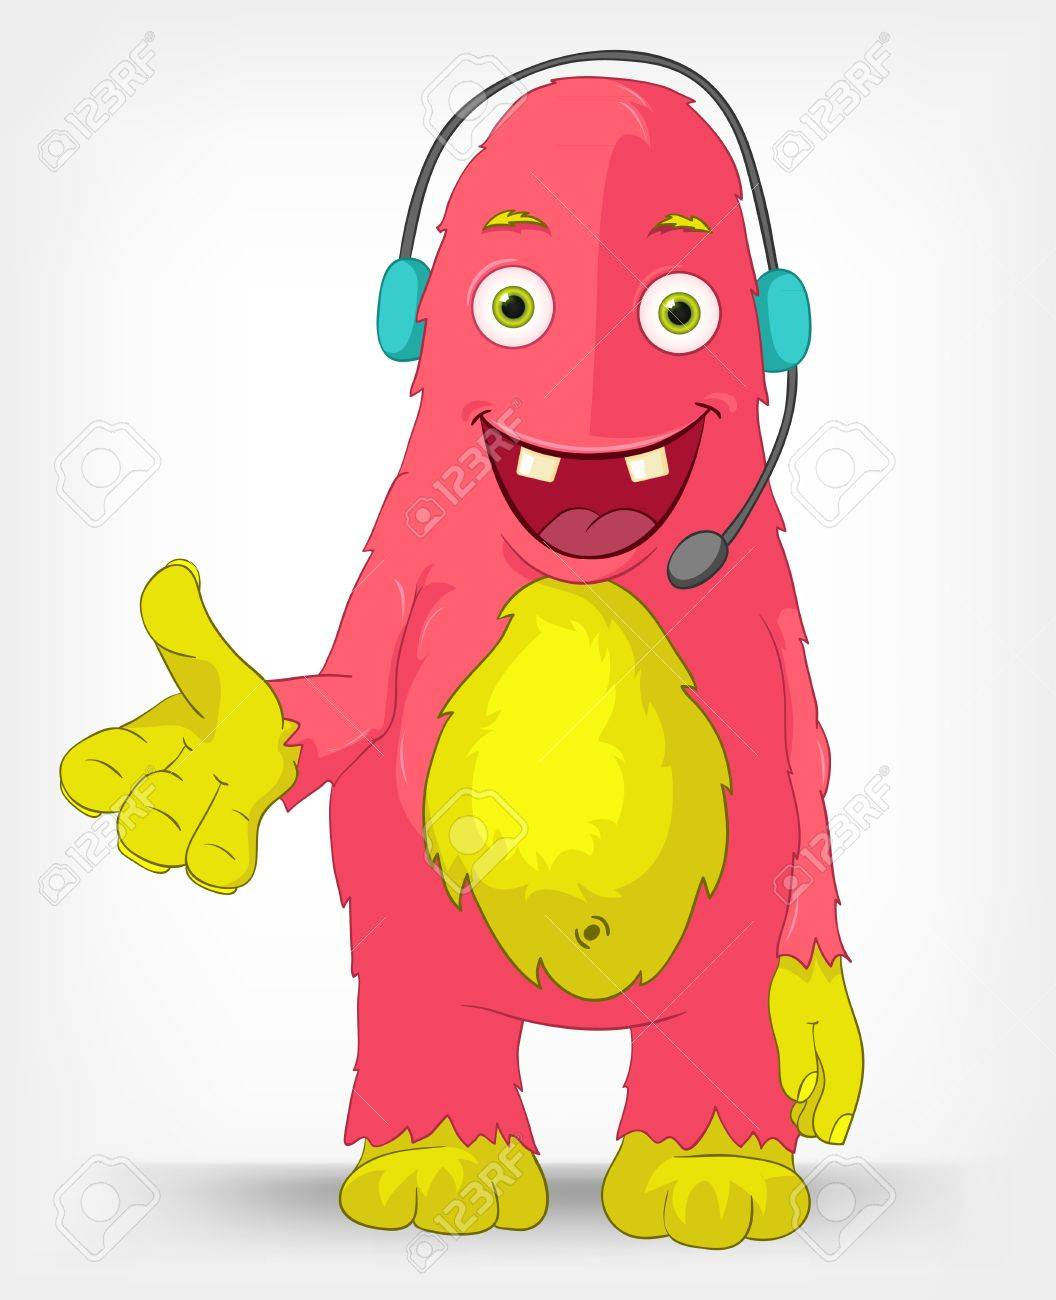 Funny Monster  Communication Stock Vector - 14575708